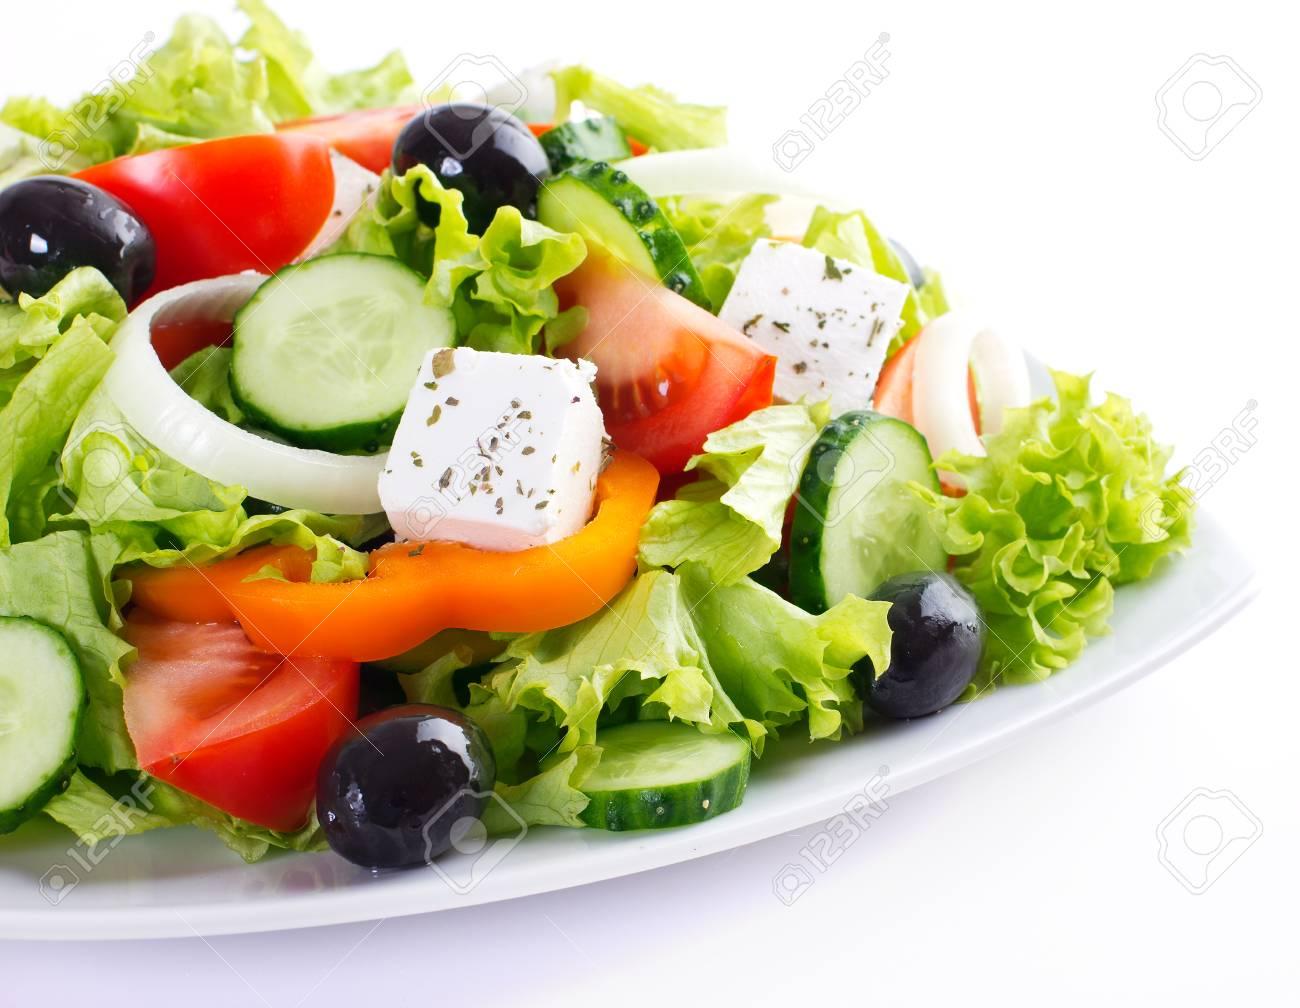 fresh vegetable salad isolated on white background - 125327251